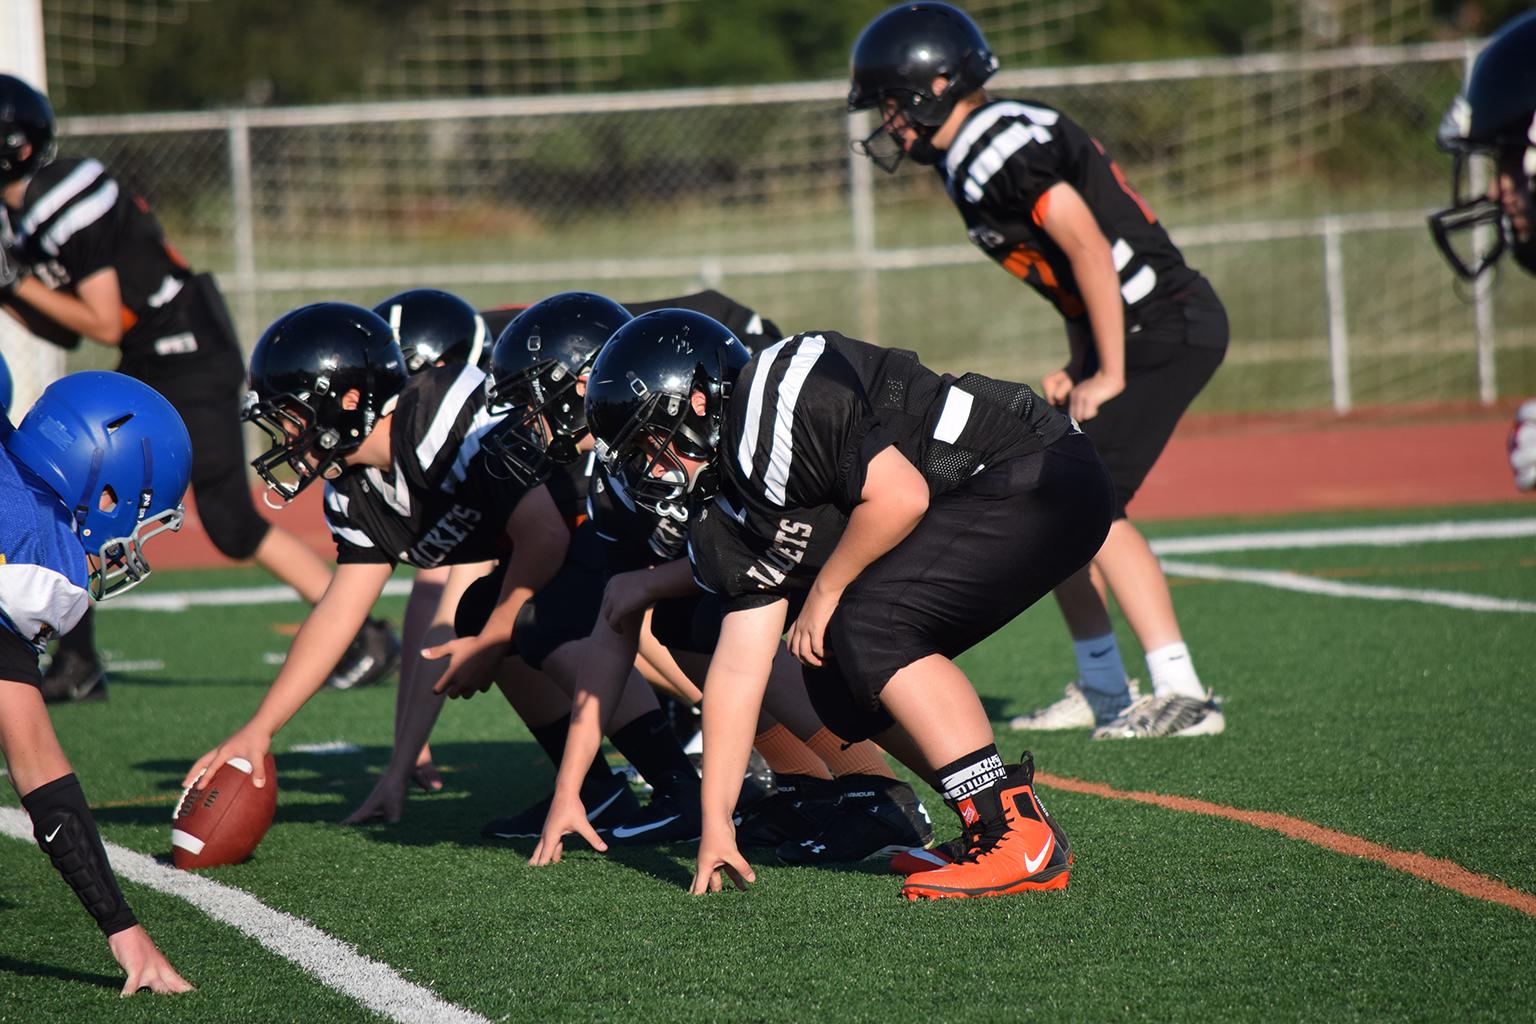 Middle School Football Line